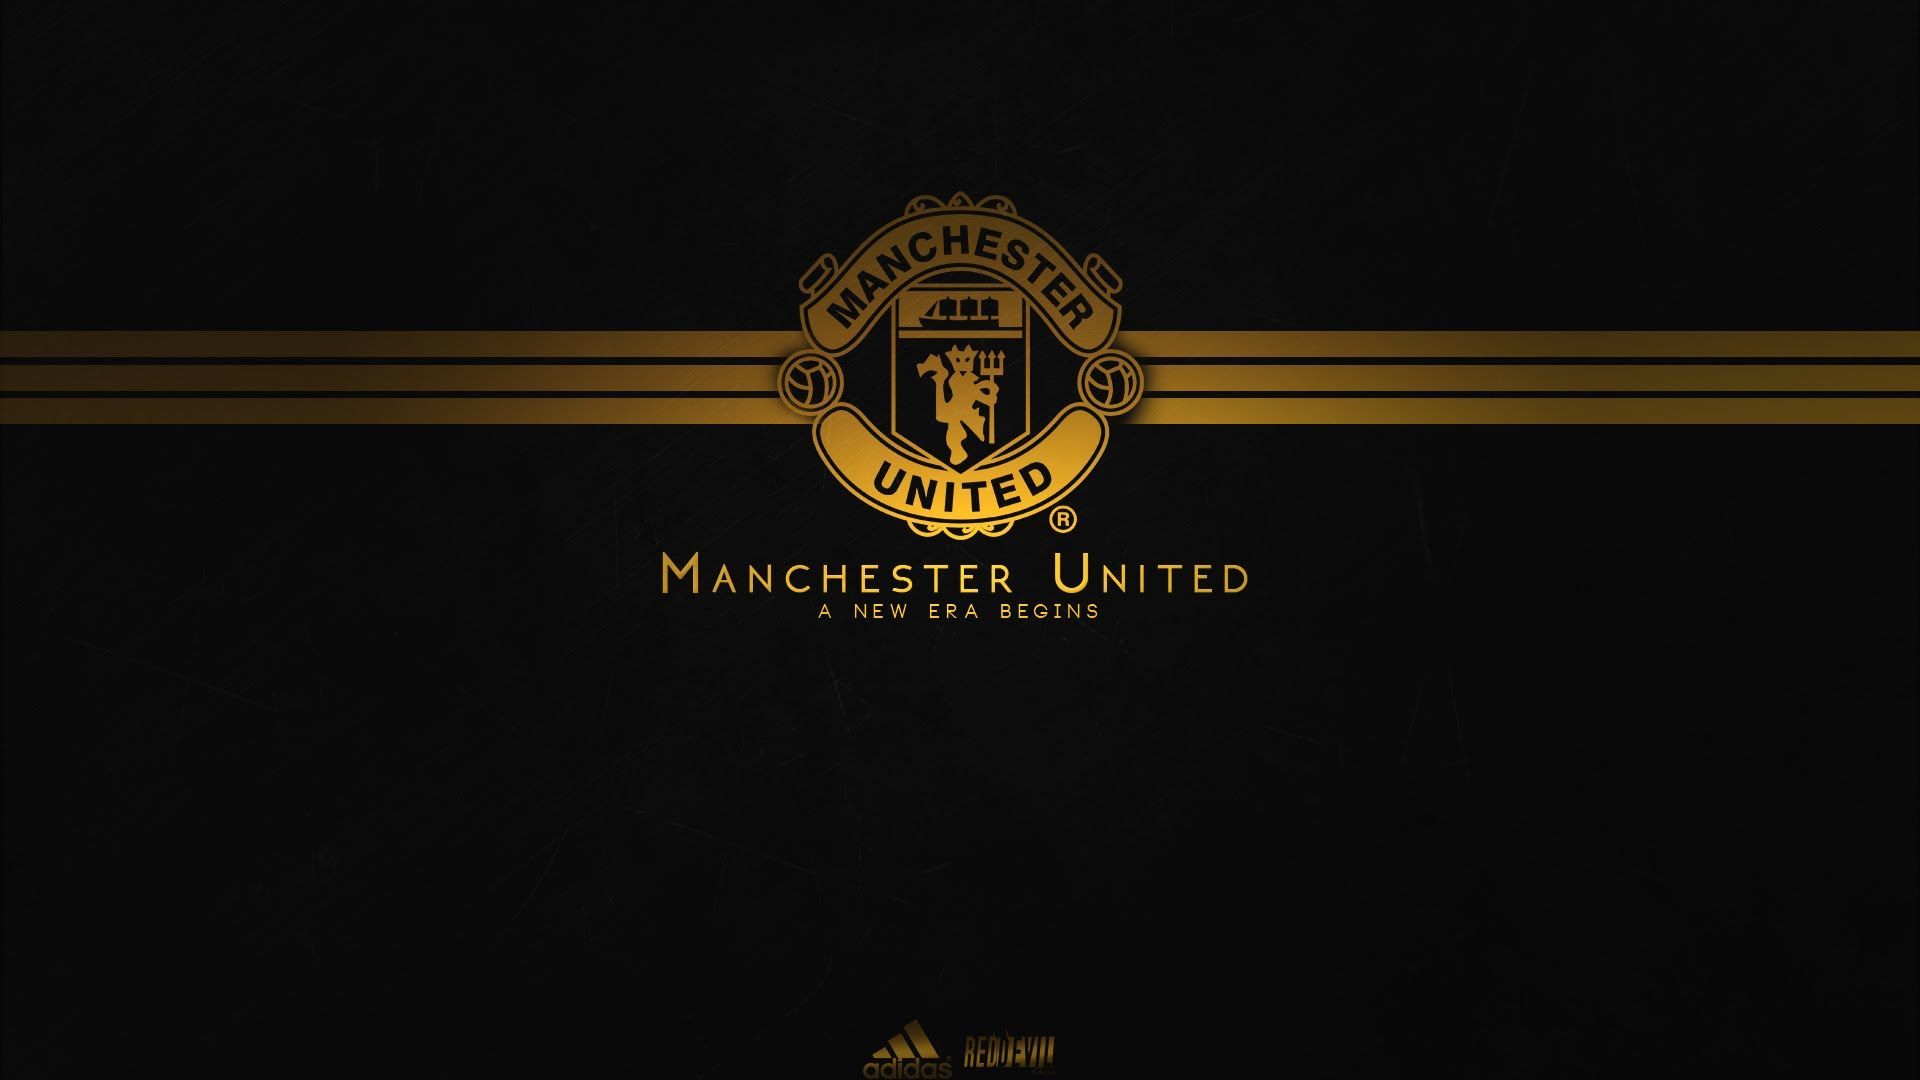 Desktop Mu Logo Wallpapers Wallpapers Backgrounds Images Art Photos Manchester United Wallpaper Manchester United Manchester United Wallpapers Iphone